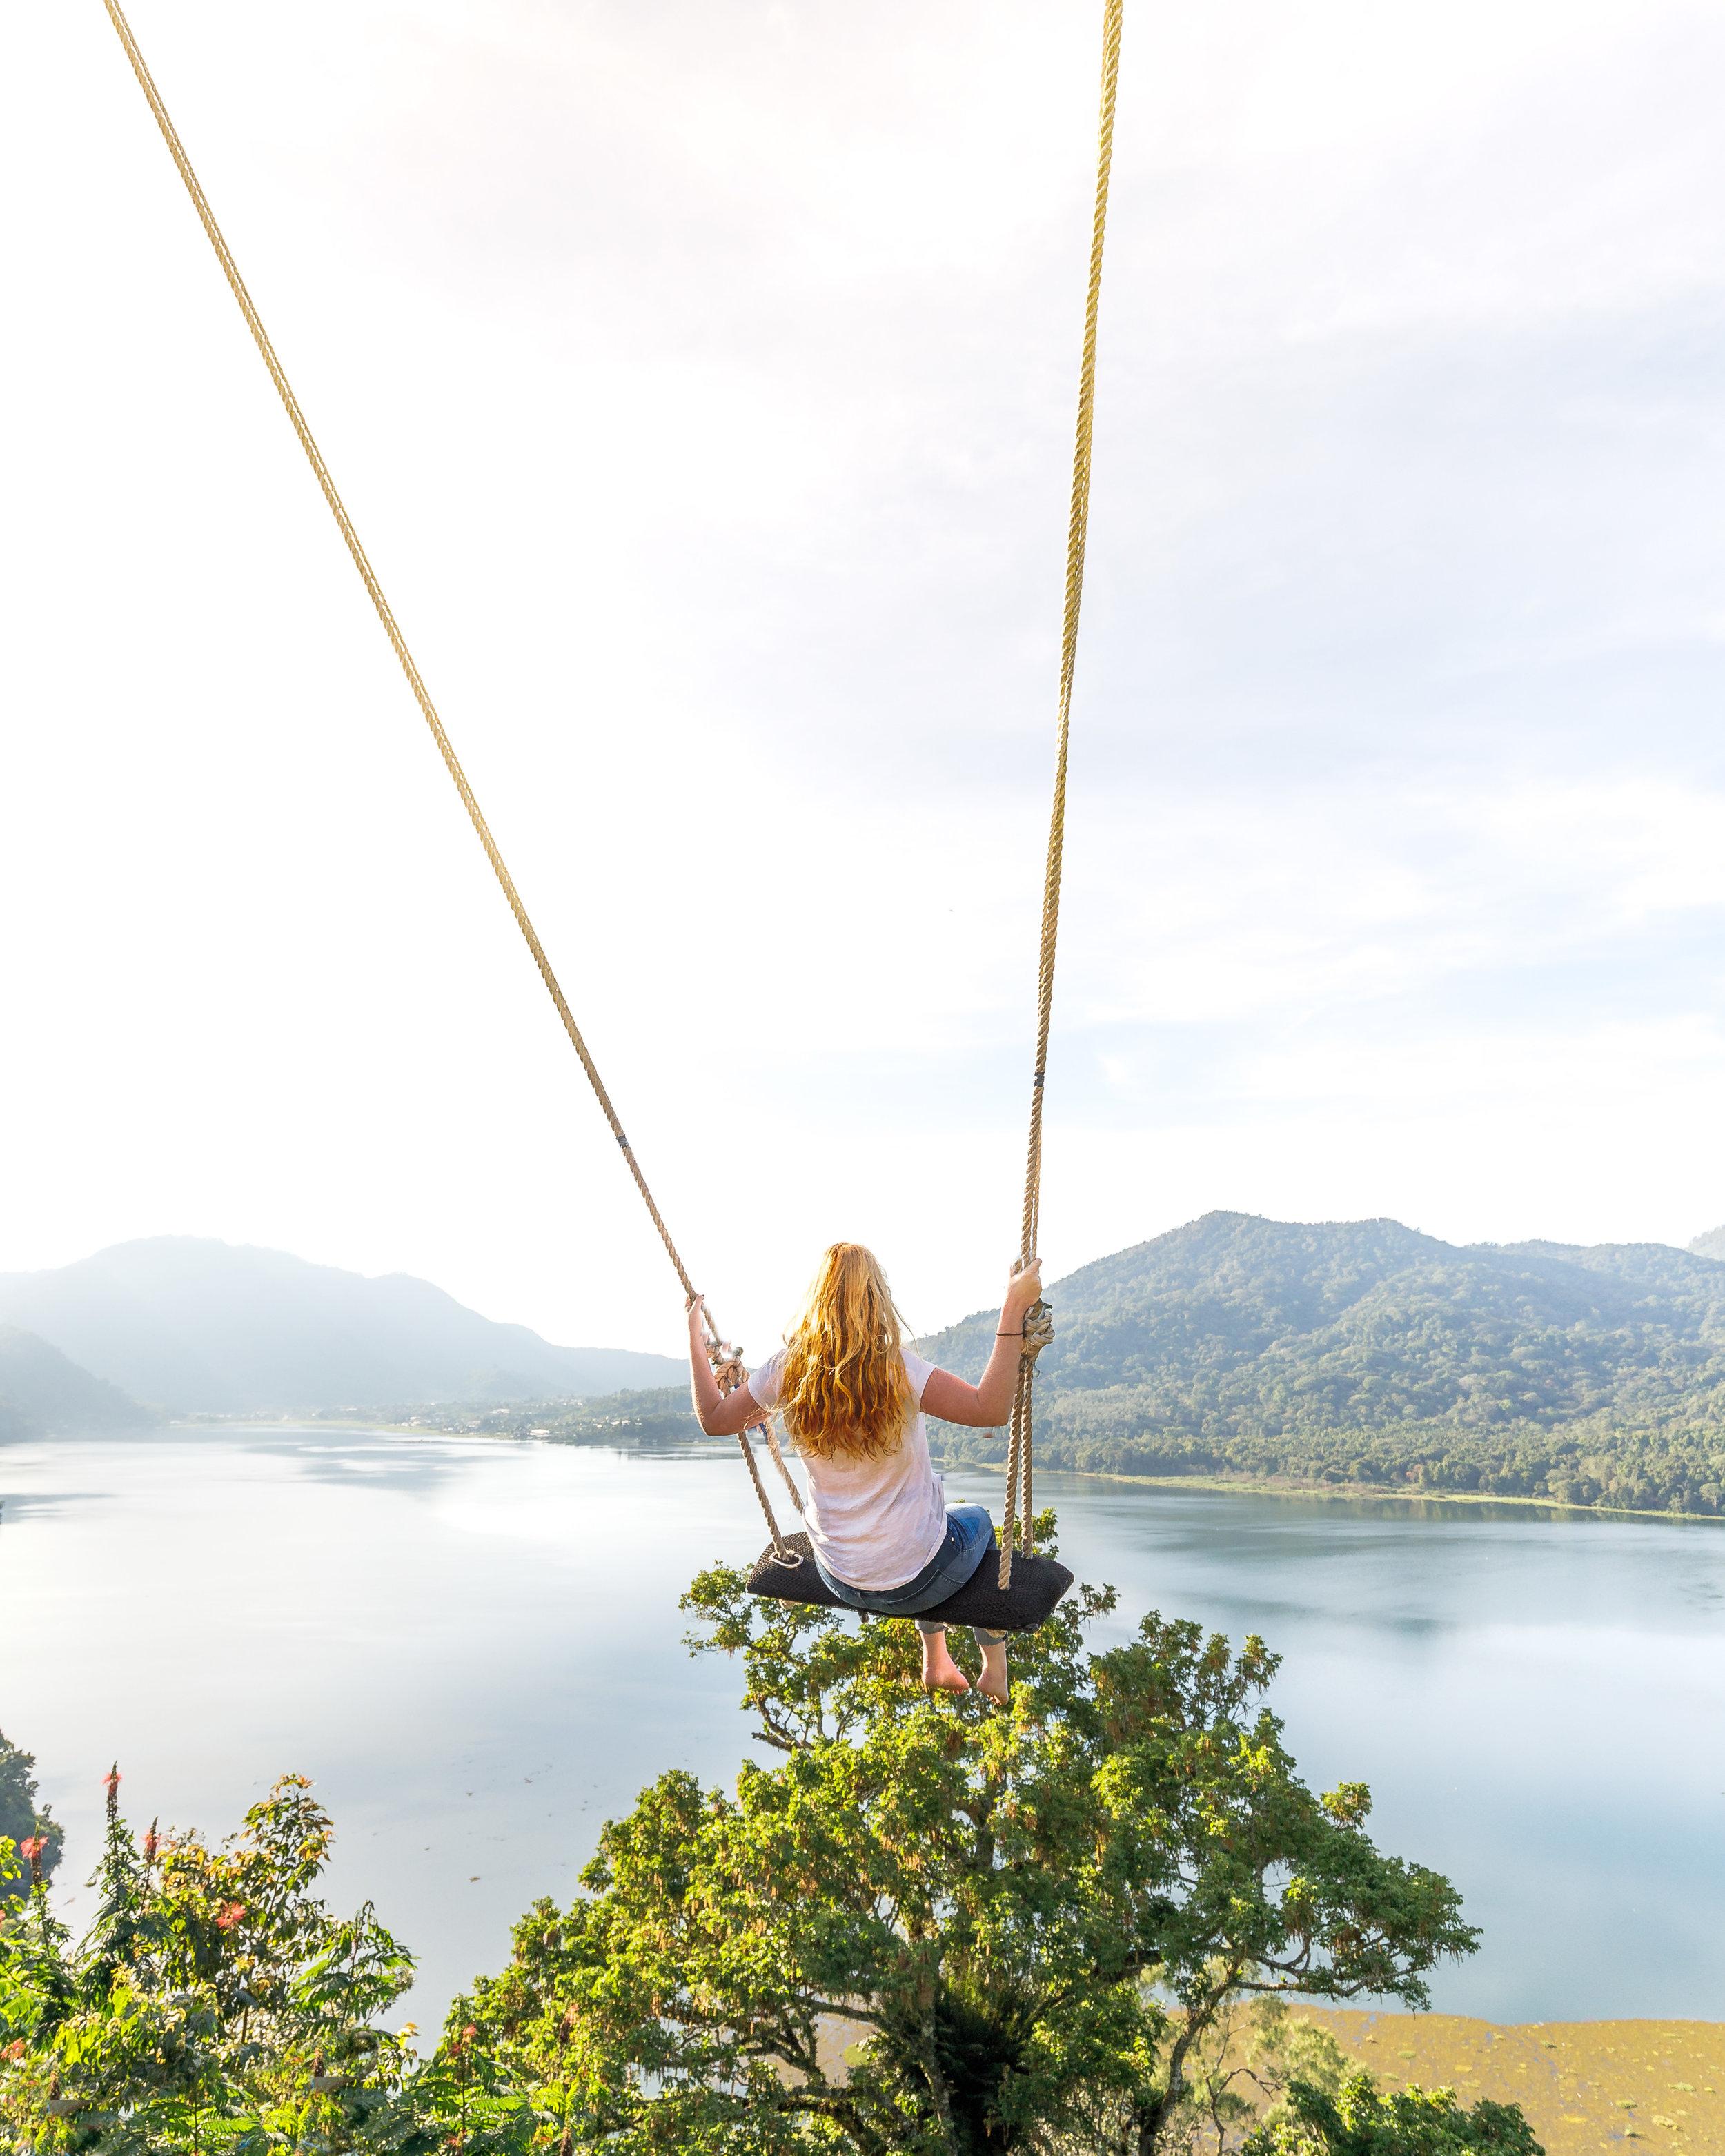 Most Instagrammable spots in Bali: Hidden Hills, Wanagiri